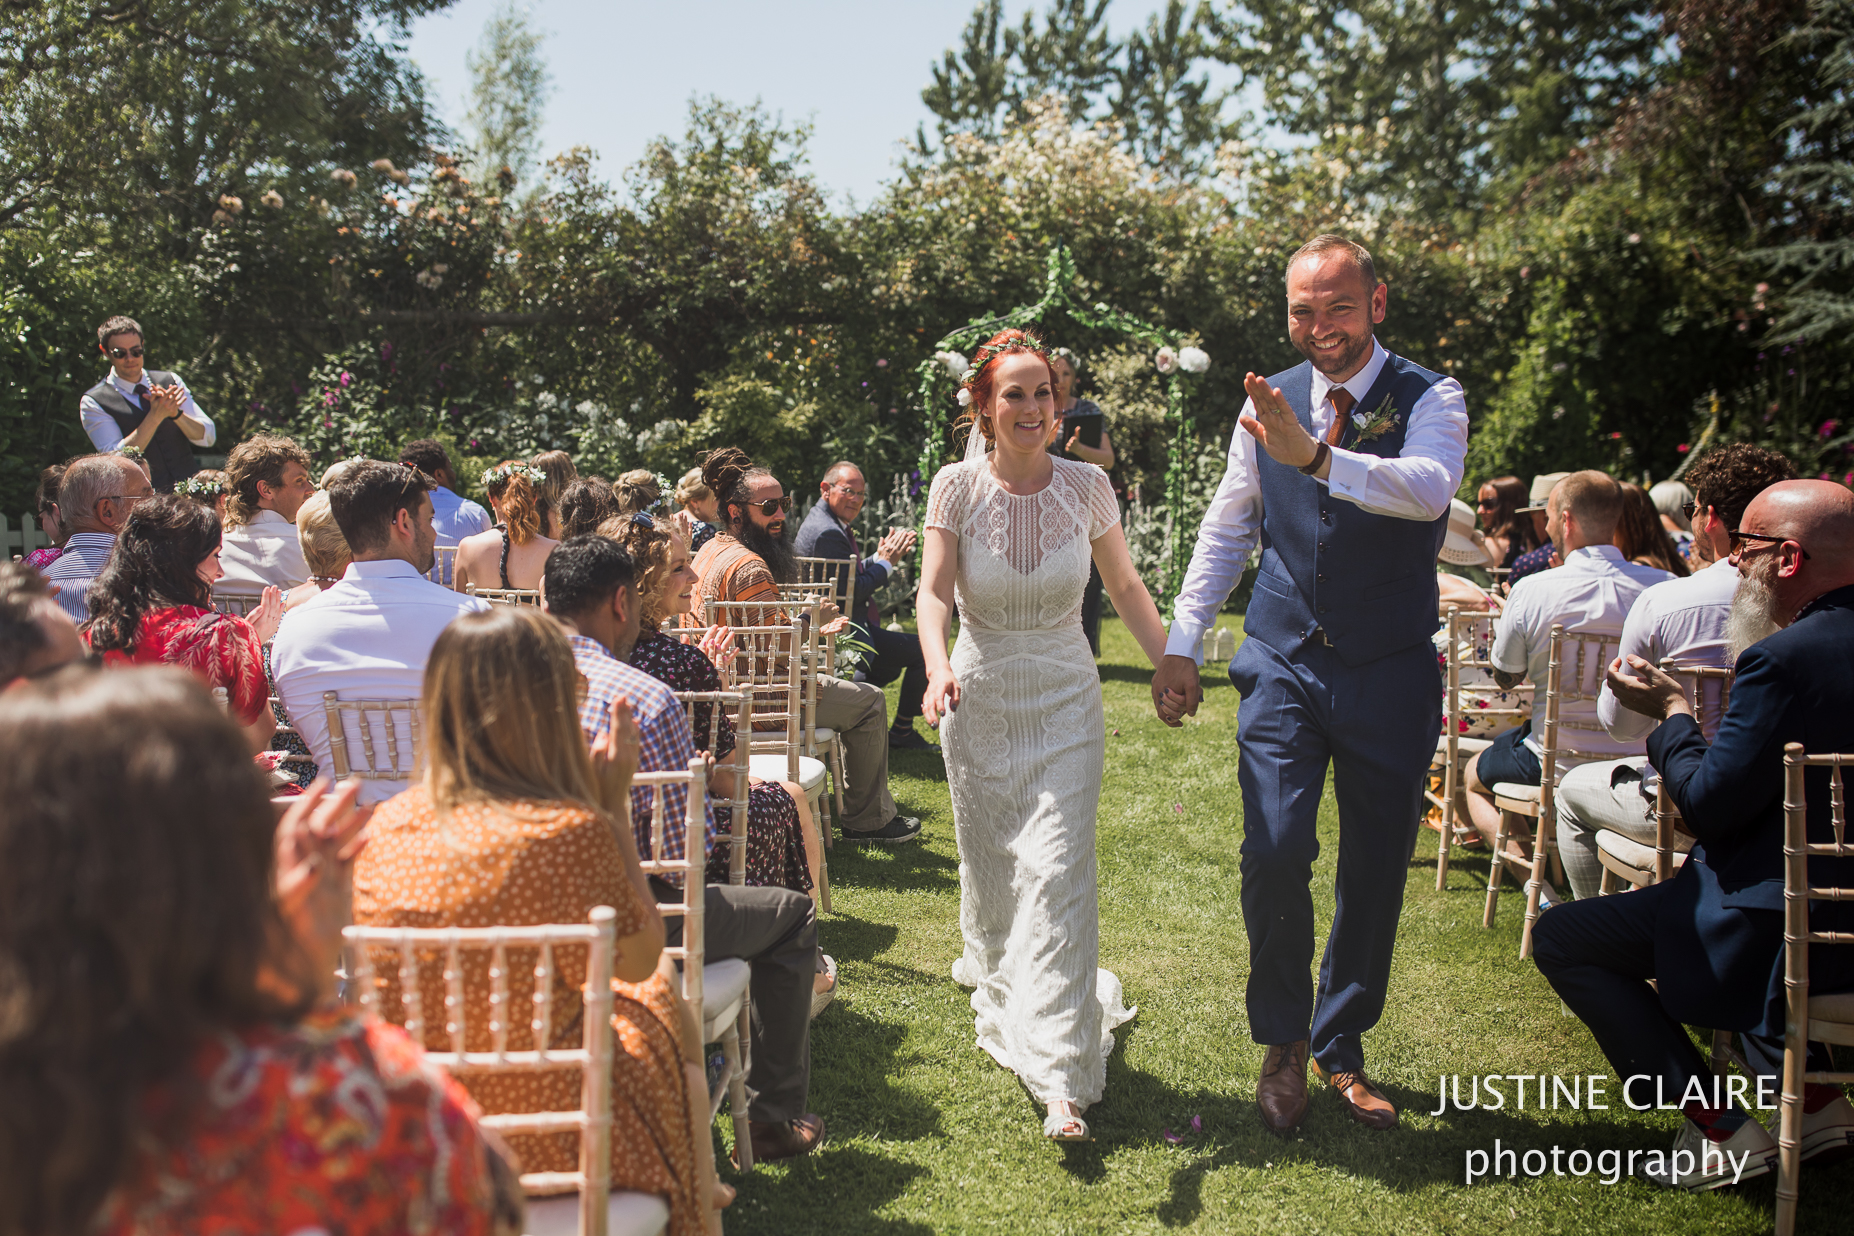 Rumbolds farm wedding photographers plaistow Billingshurst-7-5.jpg